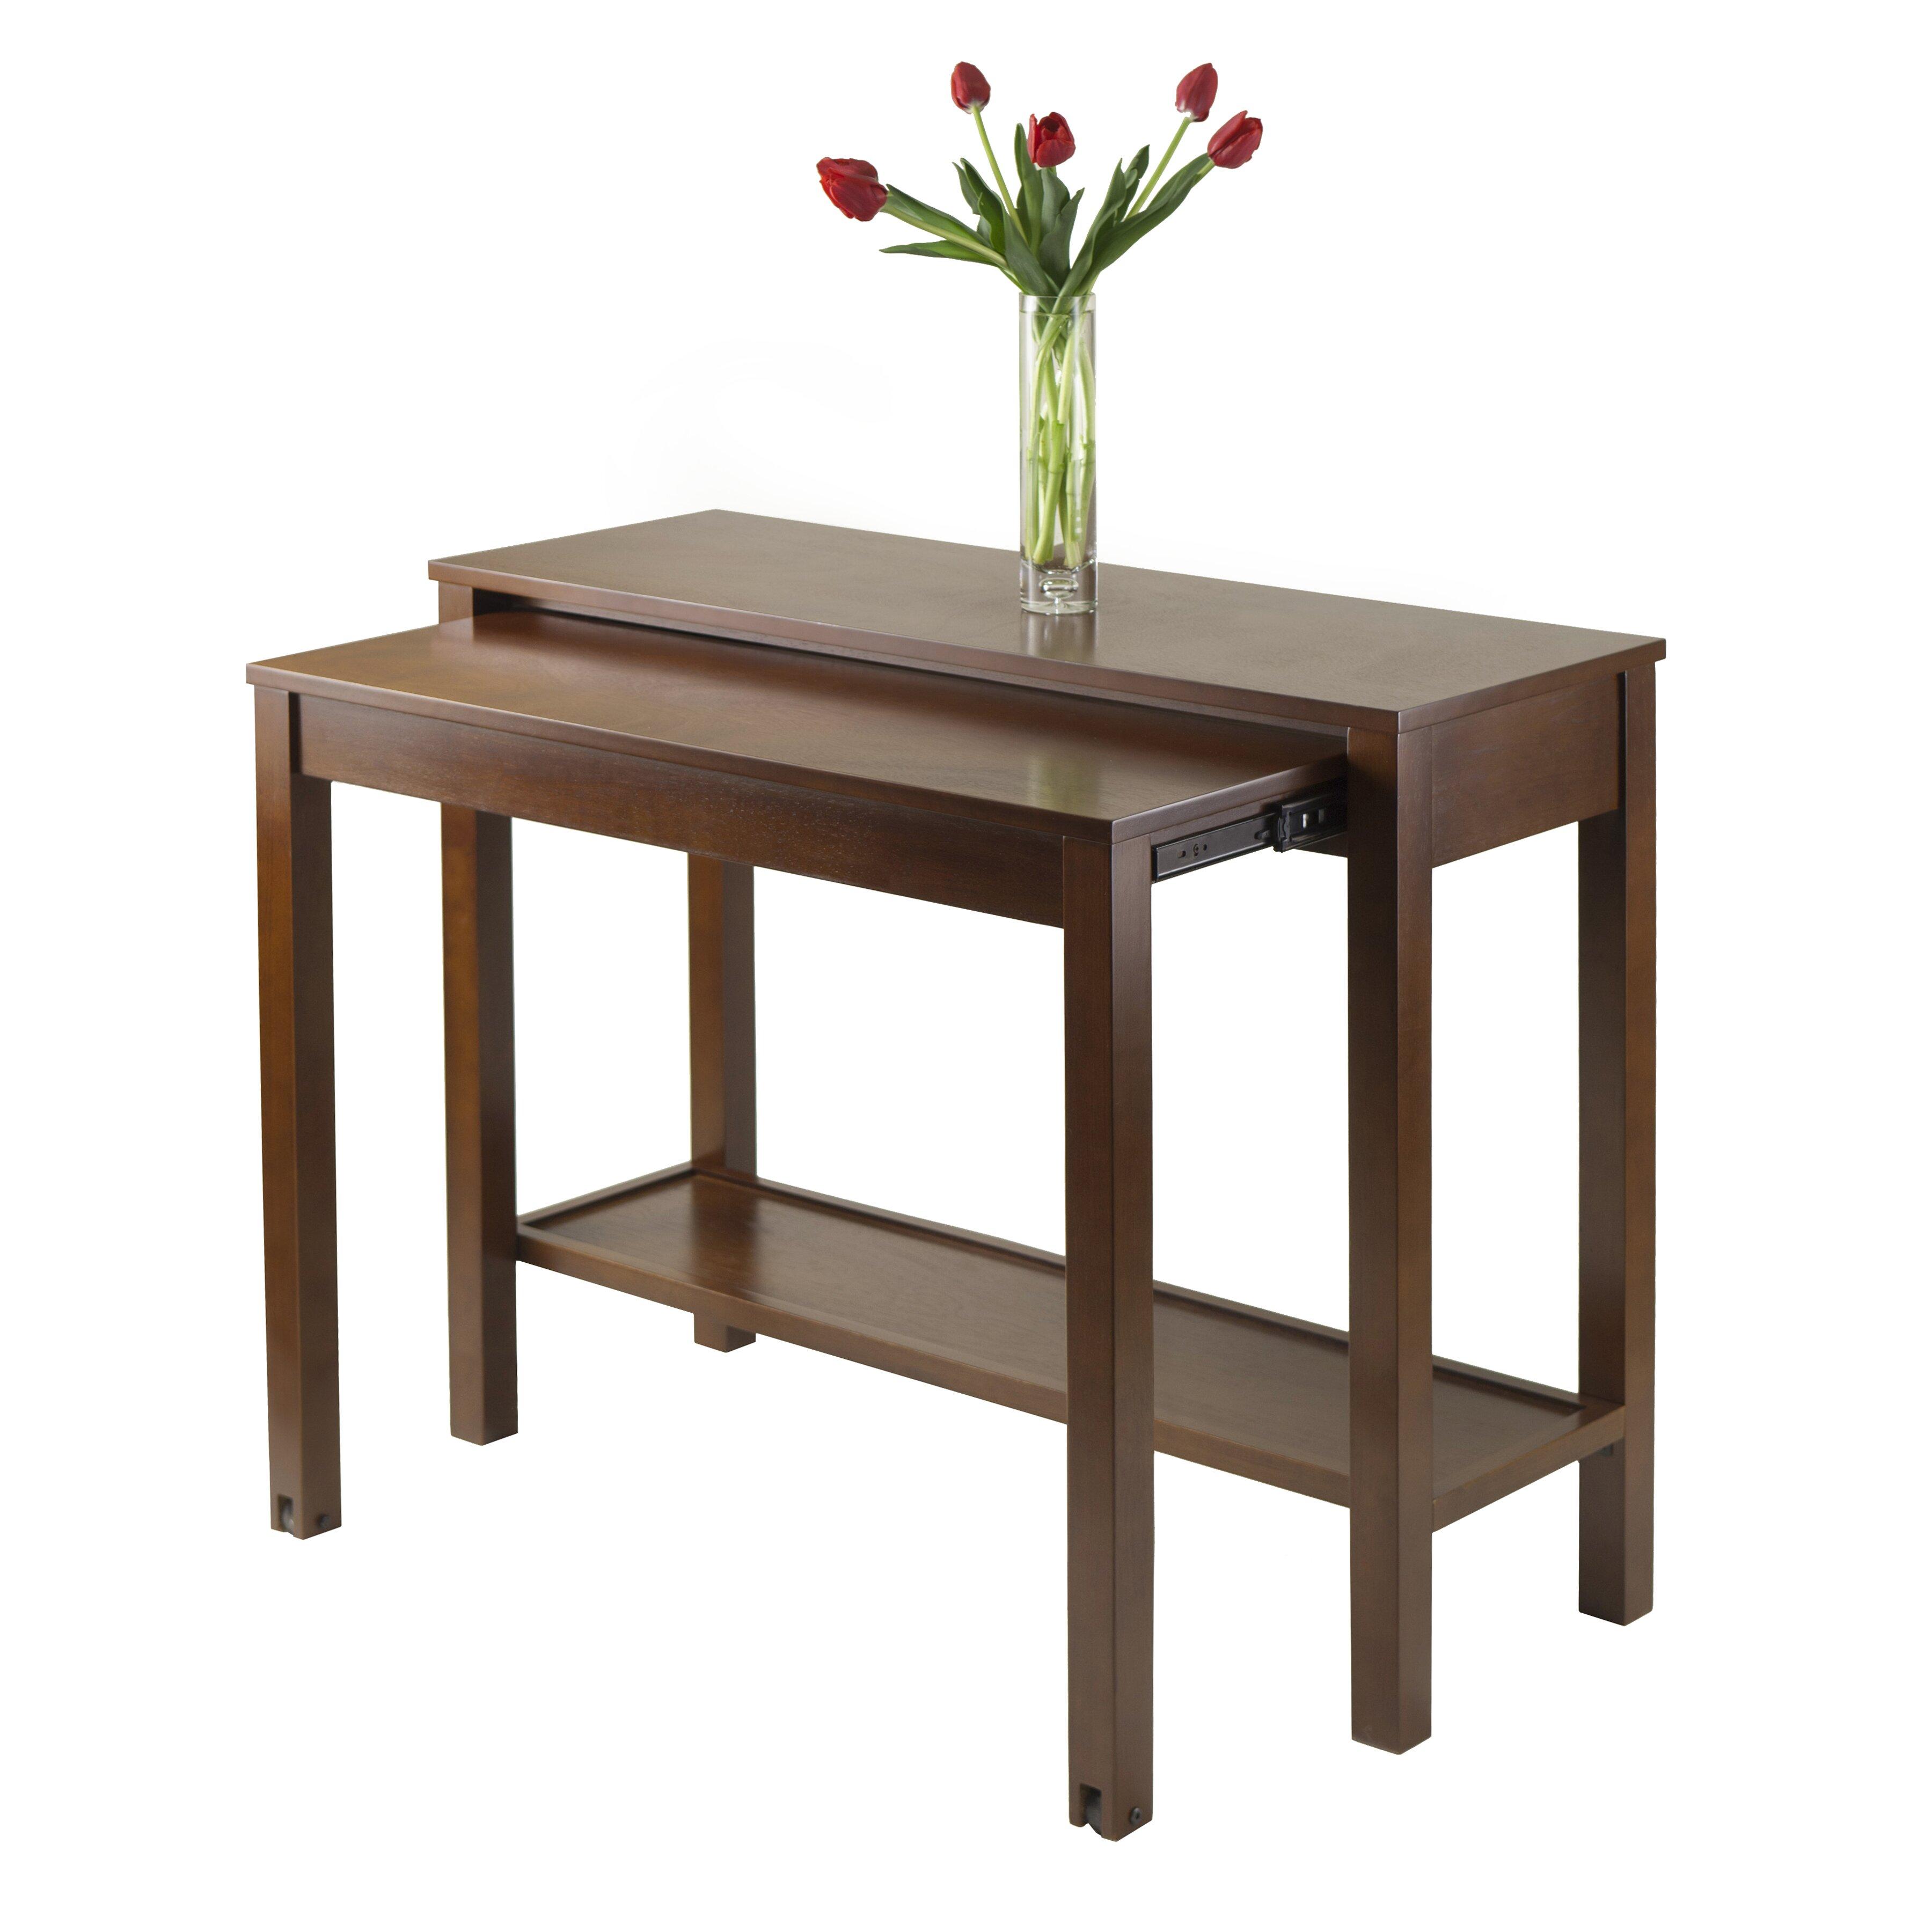 Winsome brandon expandable console table reviews wayfair for Expandable furniture